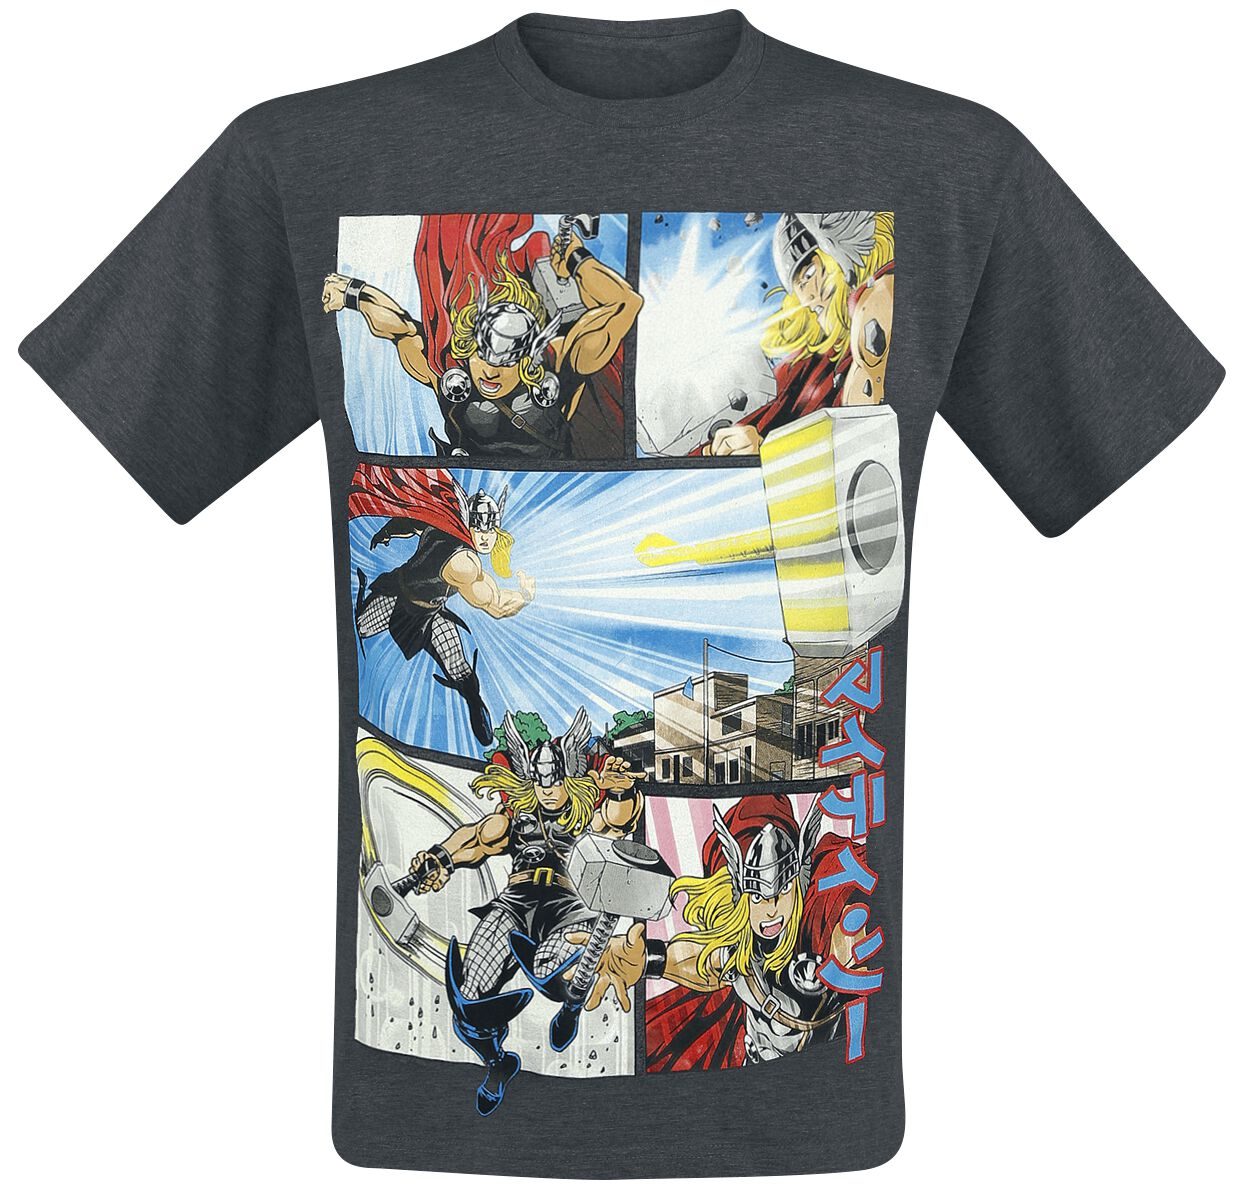 Image of   Thor Anime Panels T-Shirt blandet koks